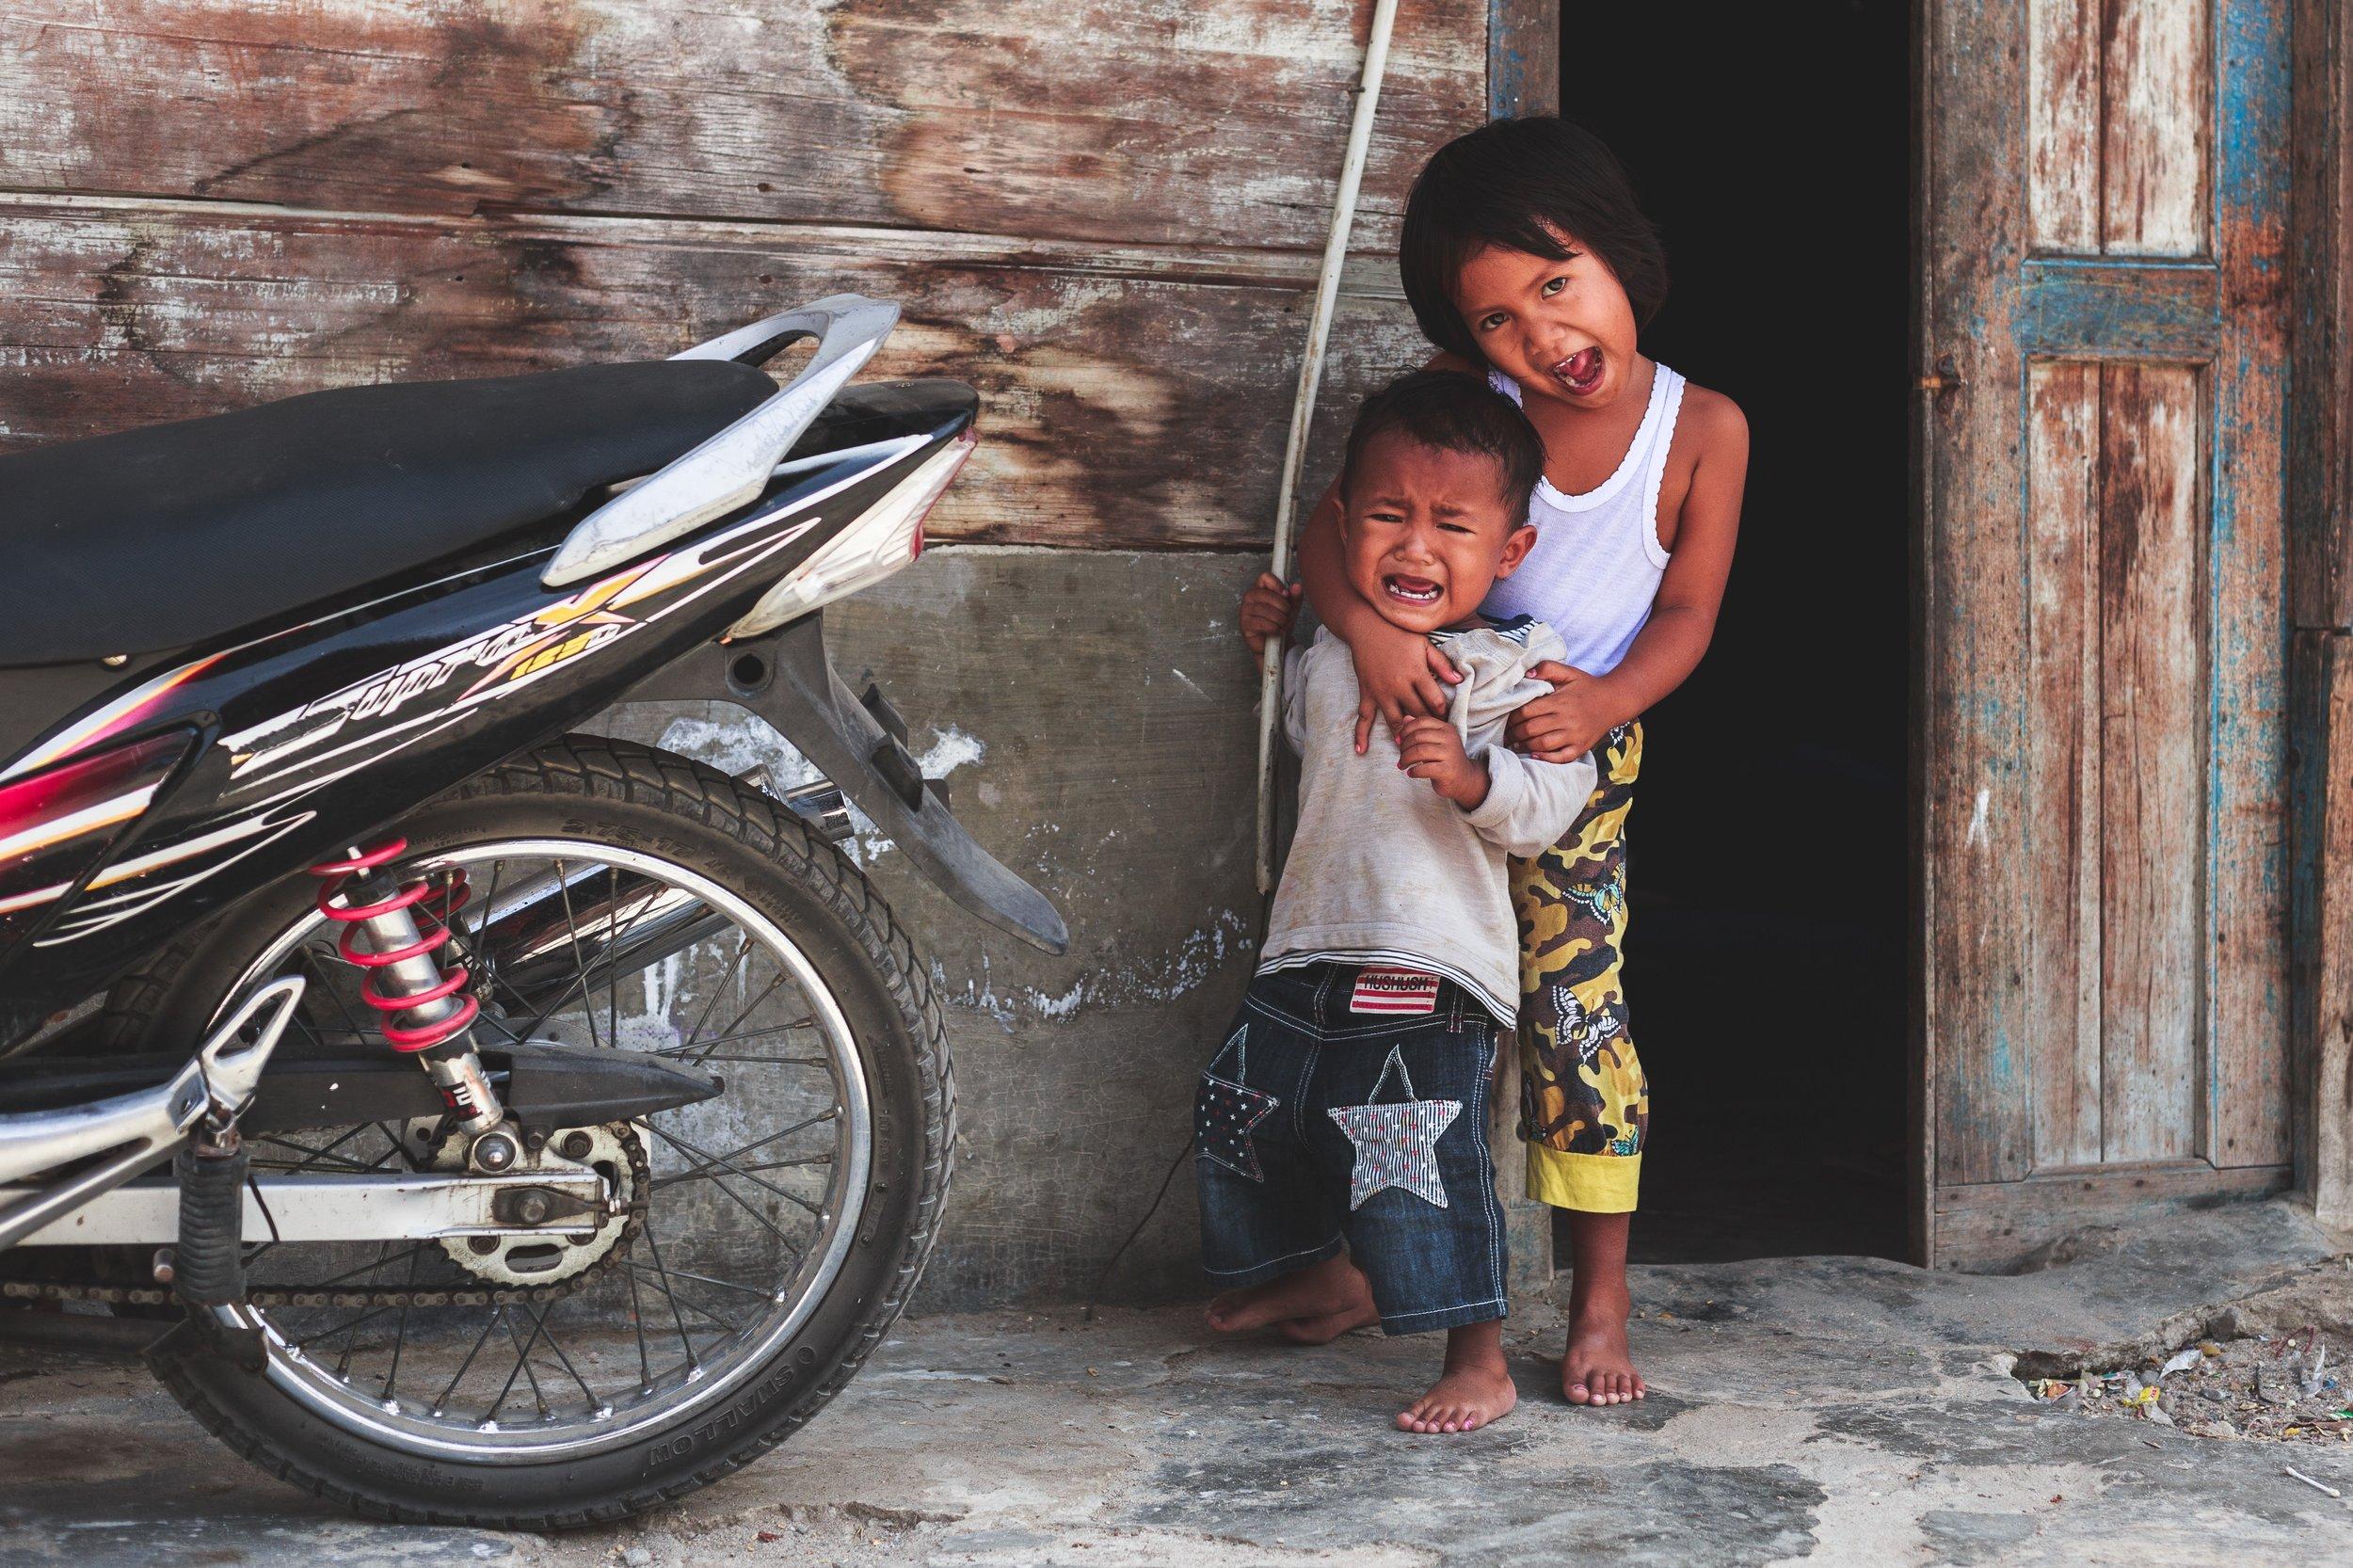 Siblings on Street Standing by Motorcyle